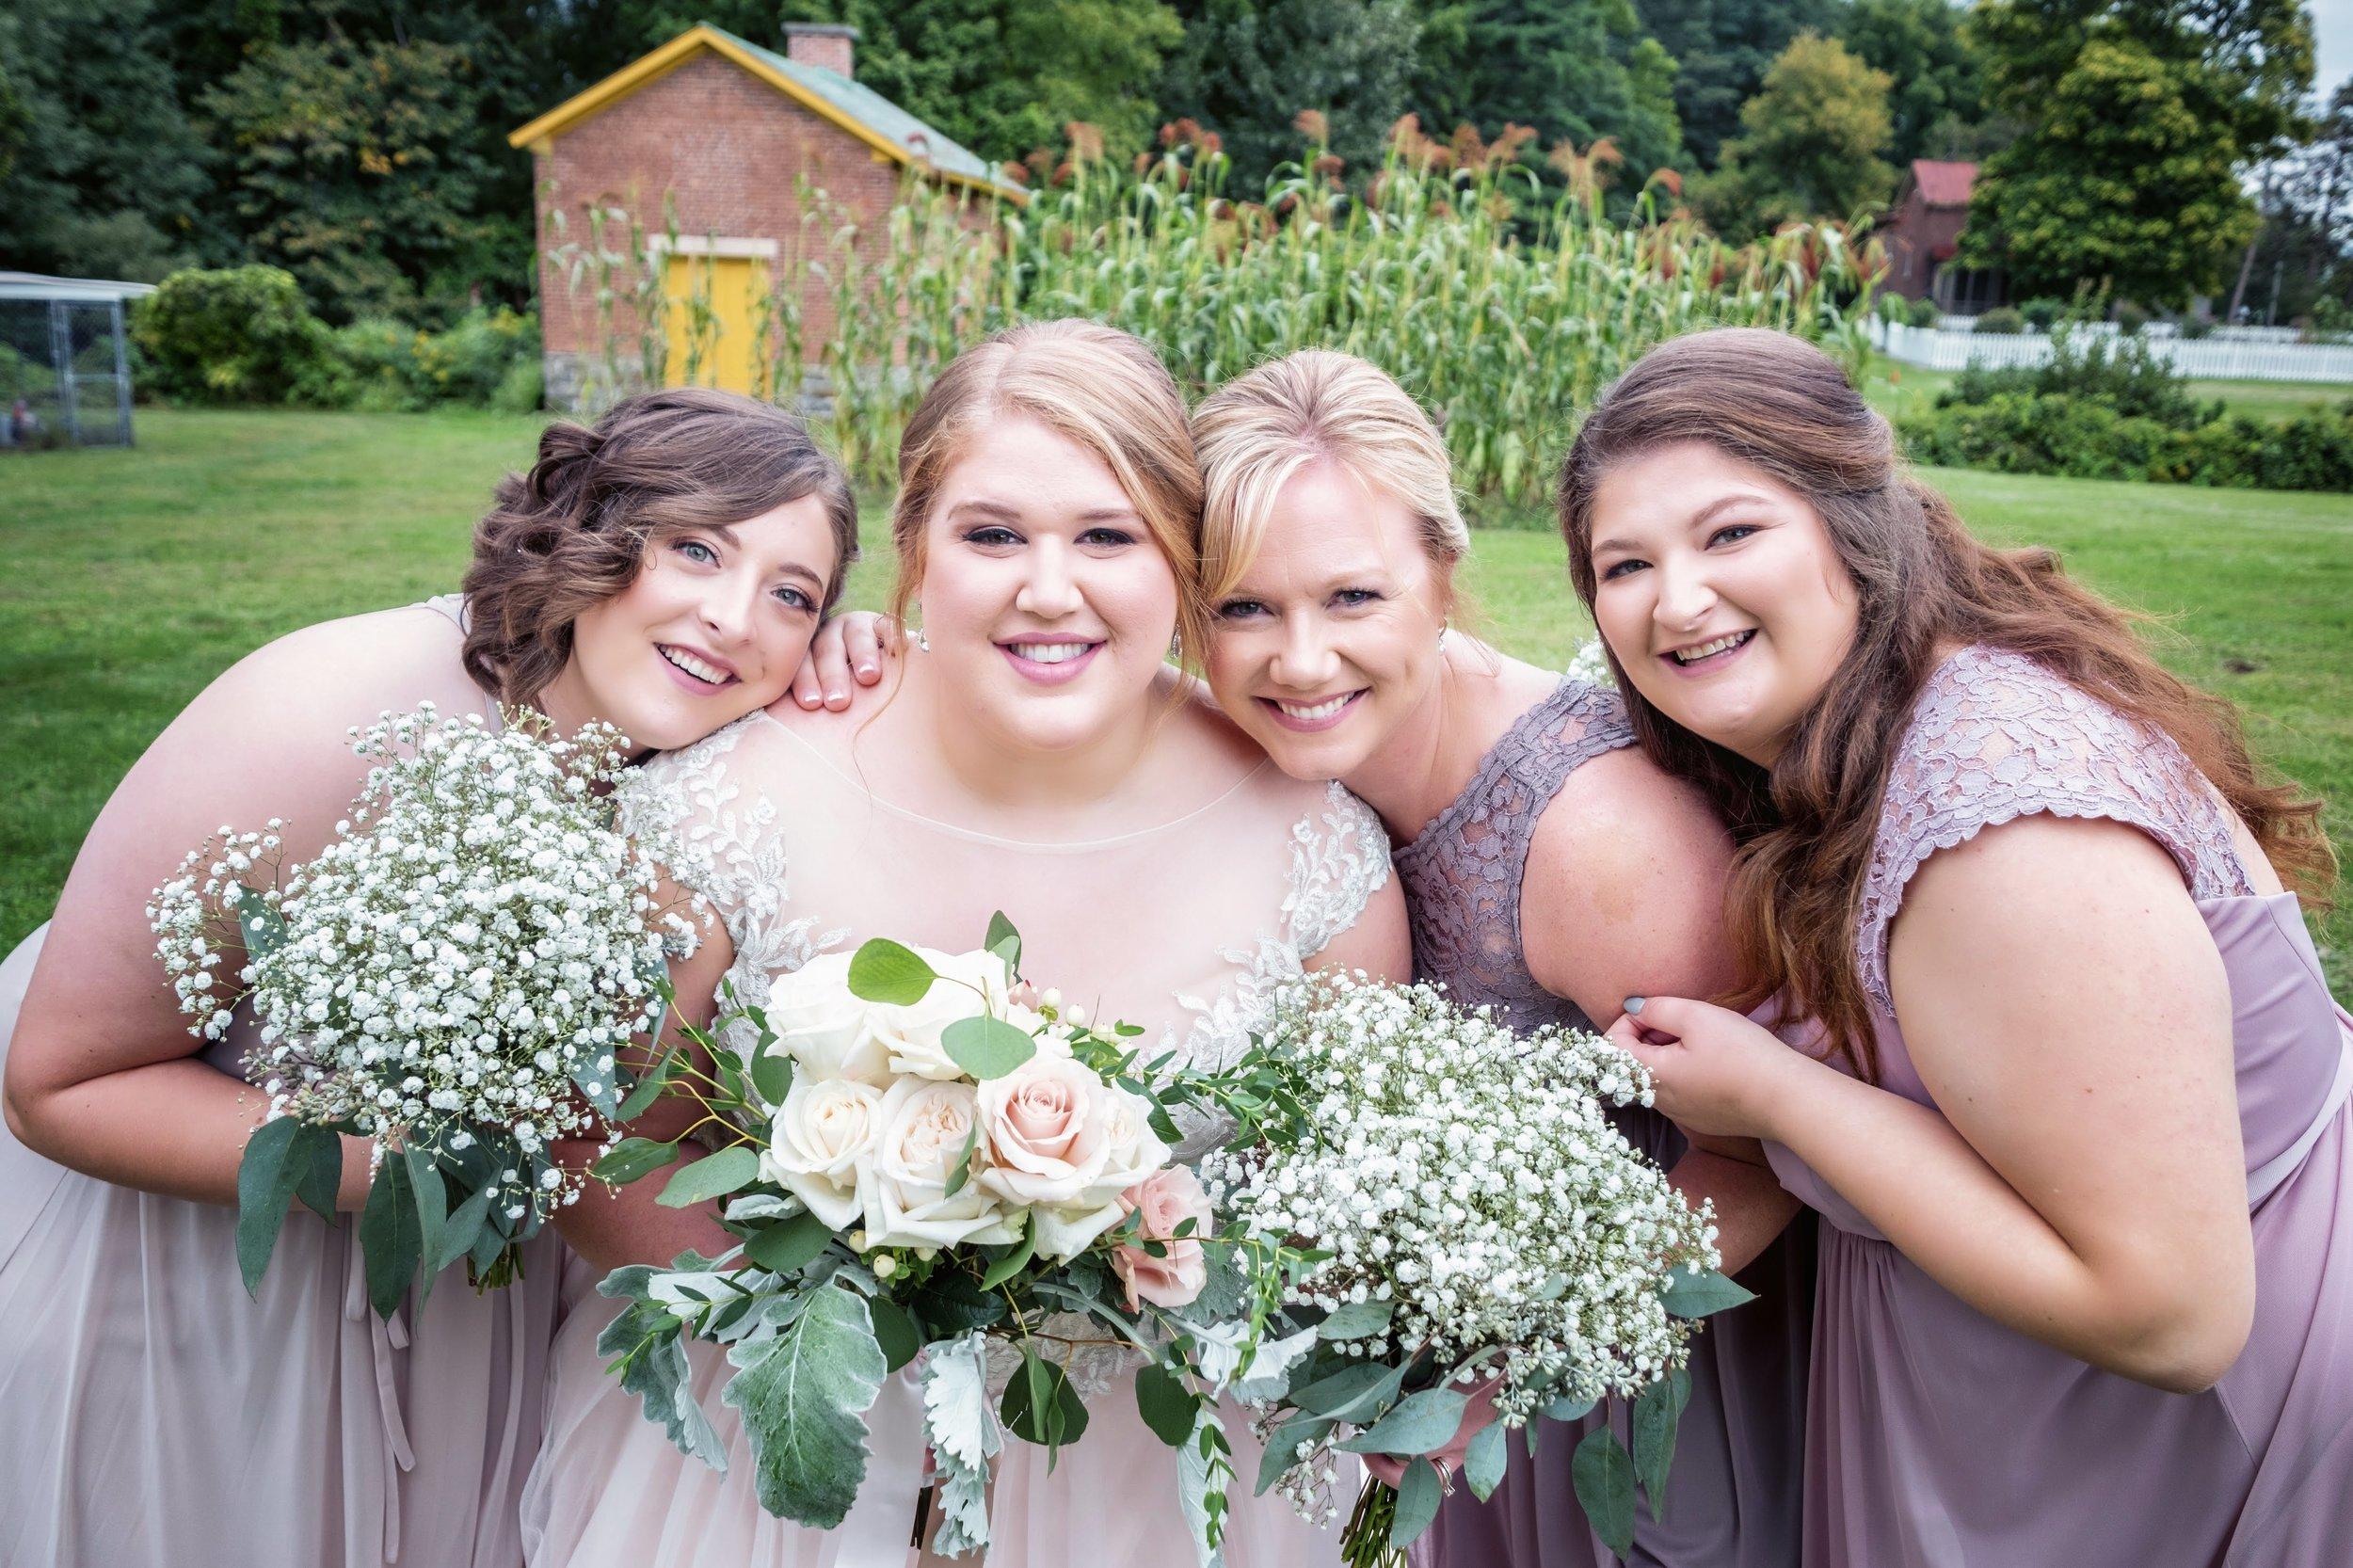 shaker-heritage-barn-wedding-photos-009.jpg